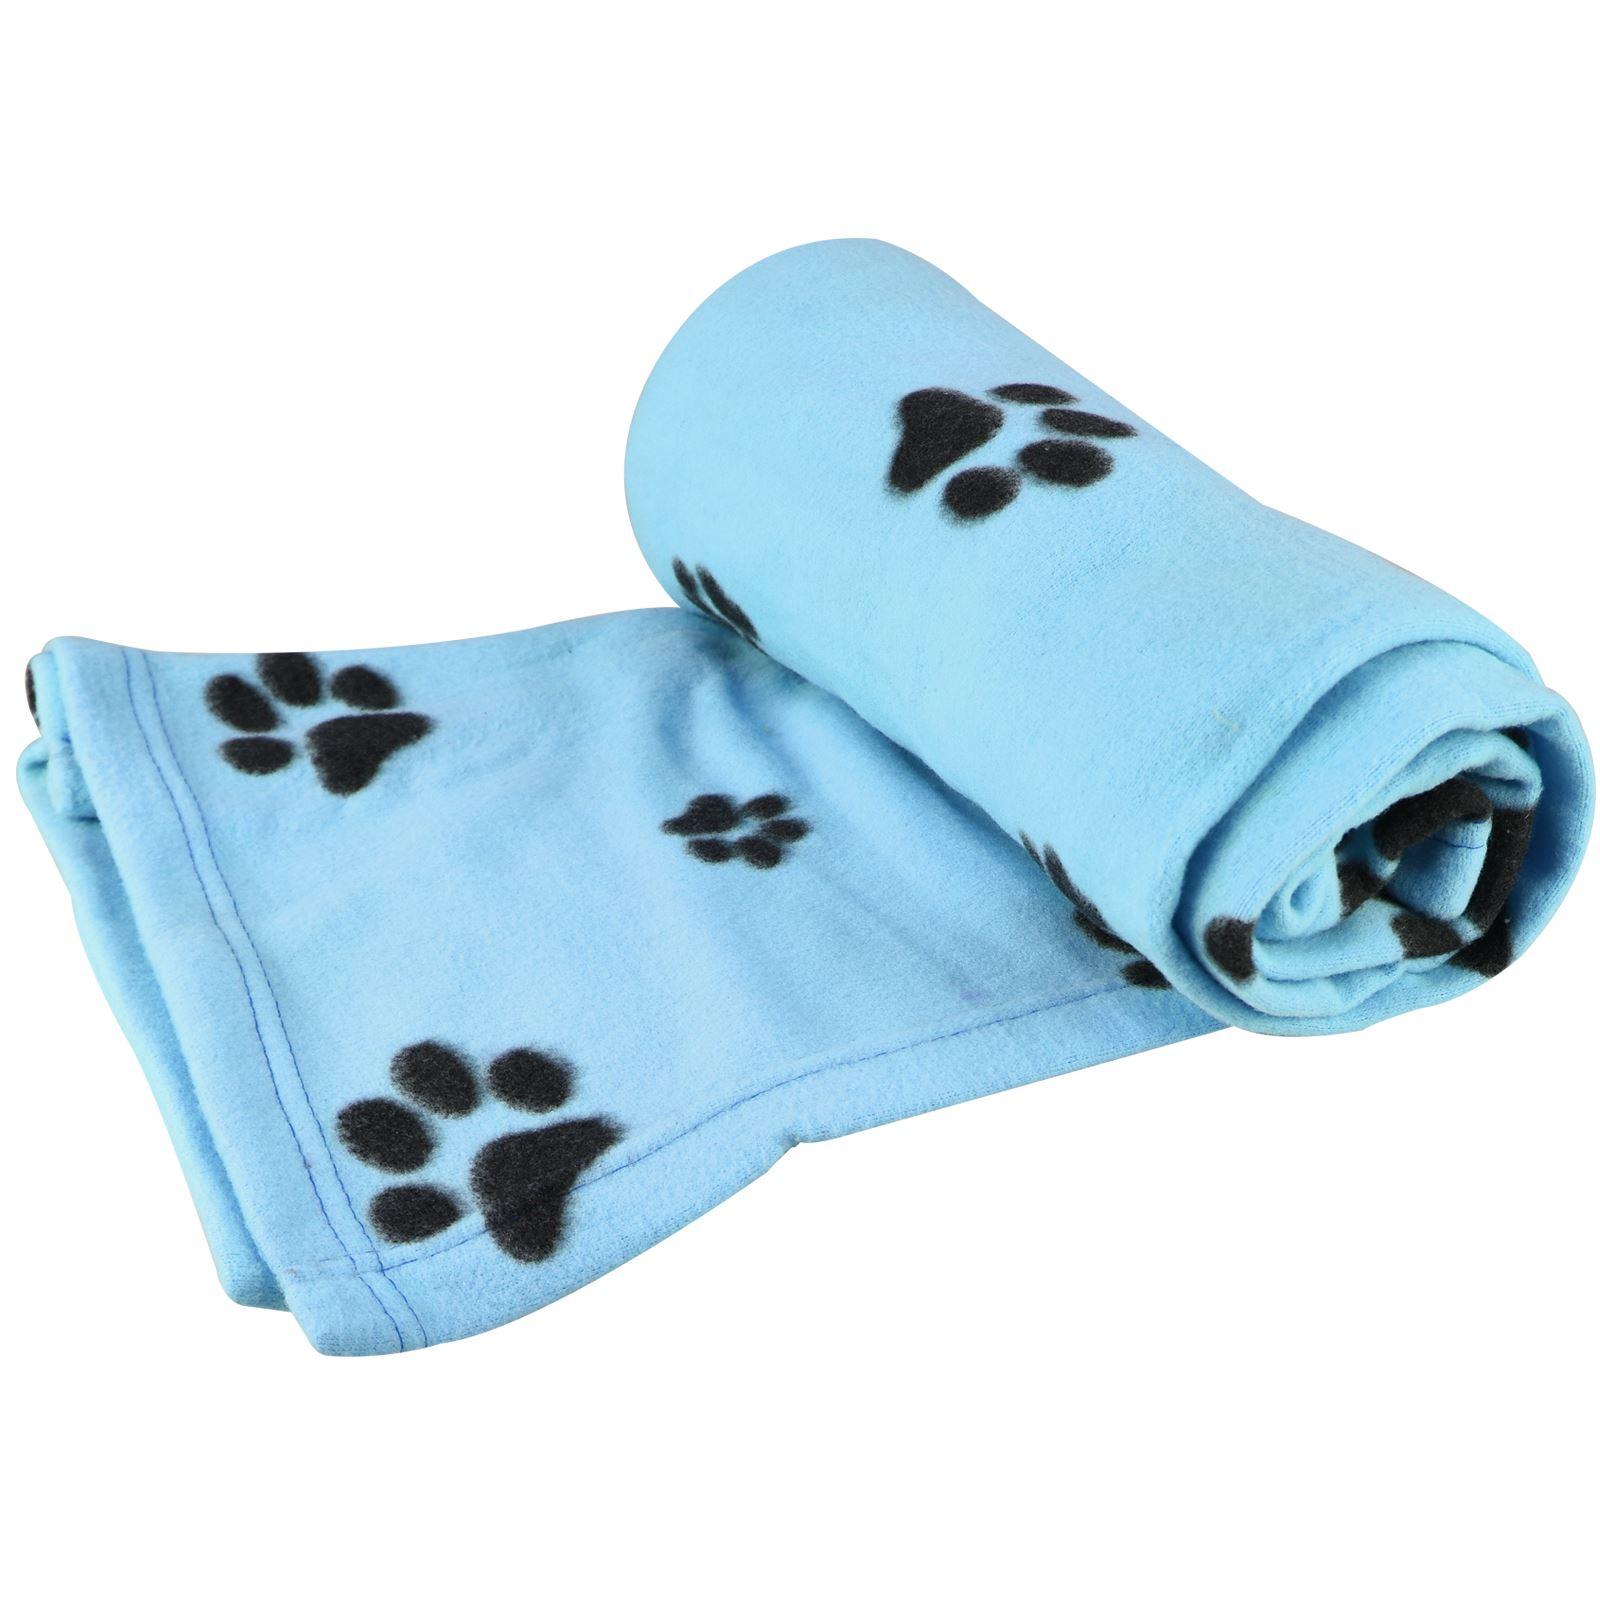 Warm-Pet-Mat-Paw-Print-Cat-Dog-Puppy-Fleece-Soft-Blanket-Bed-Cushion-One-Size thumbnail 13